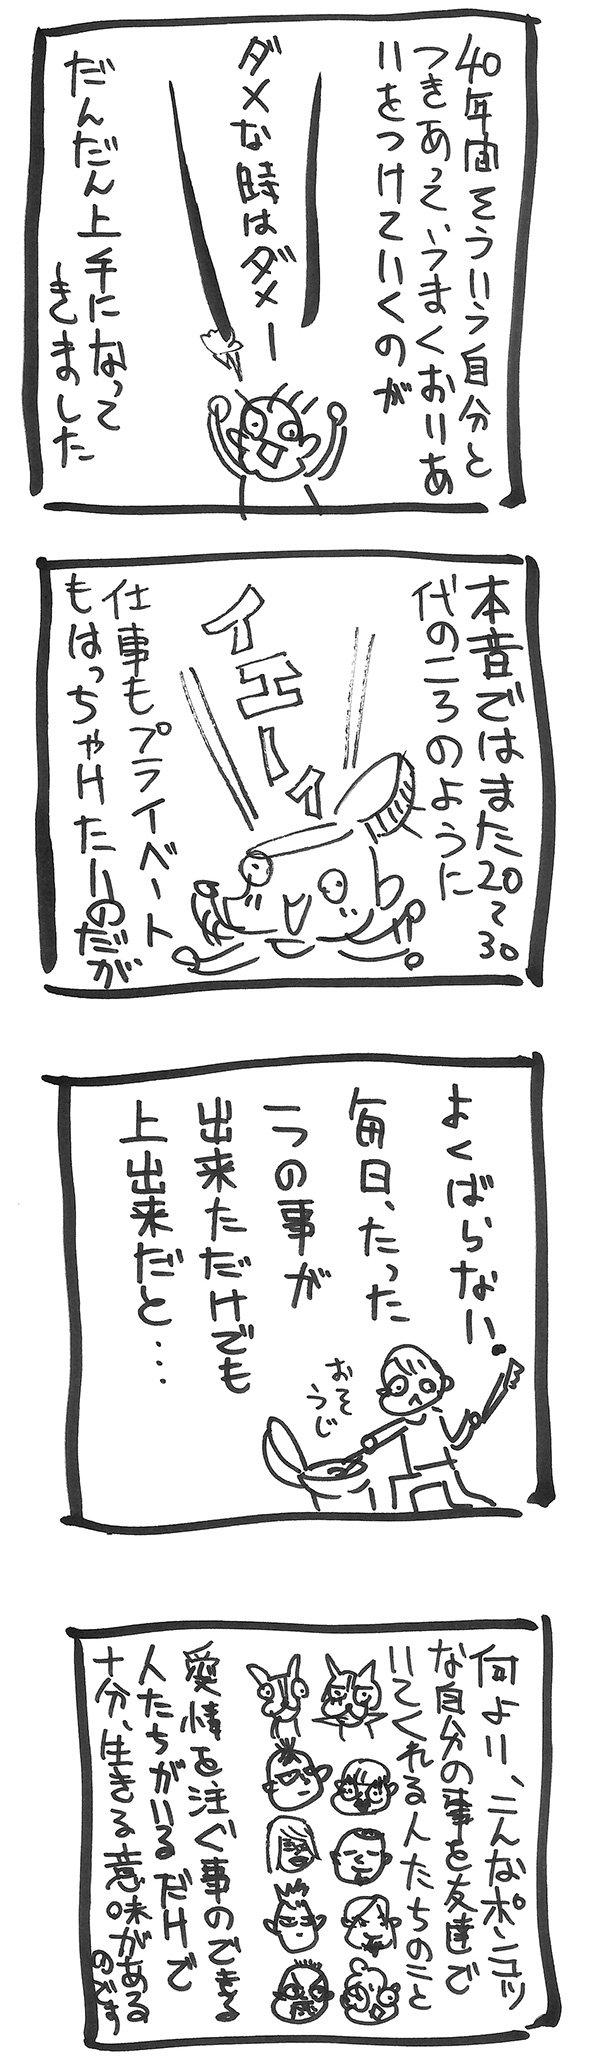 2017-10-01-2